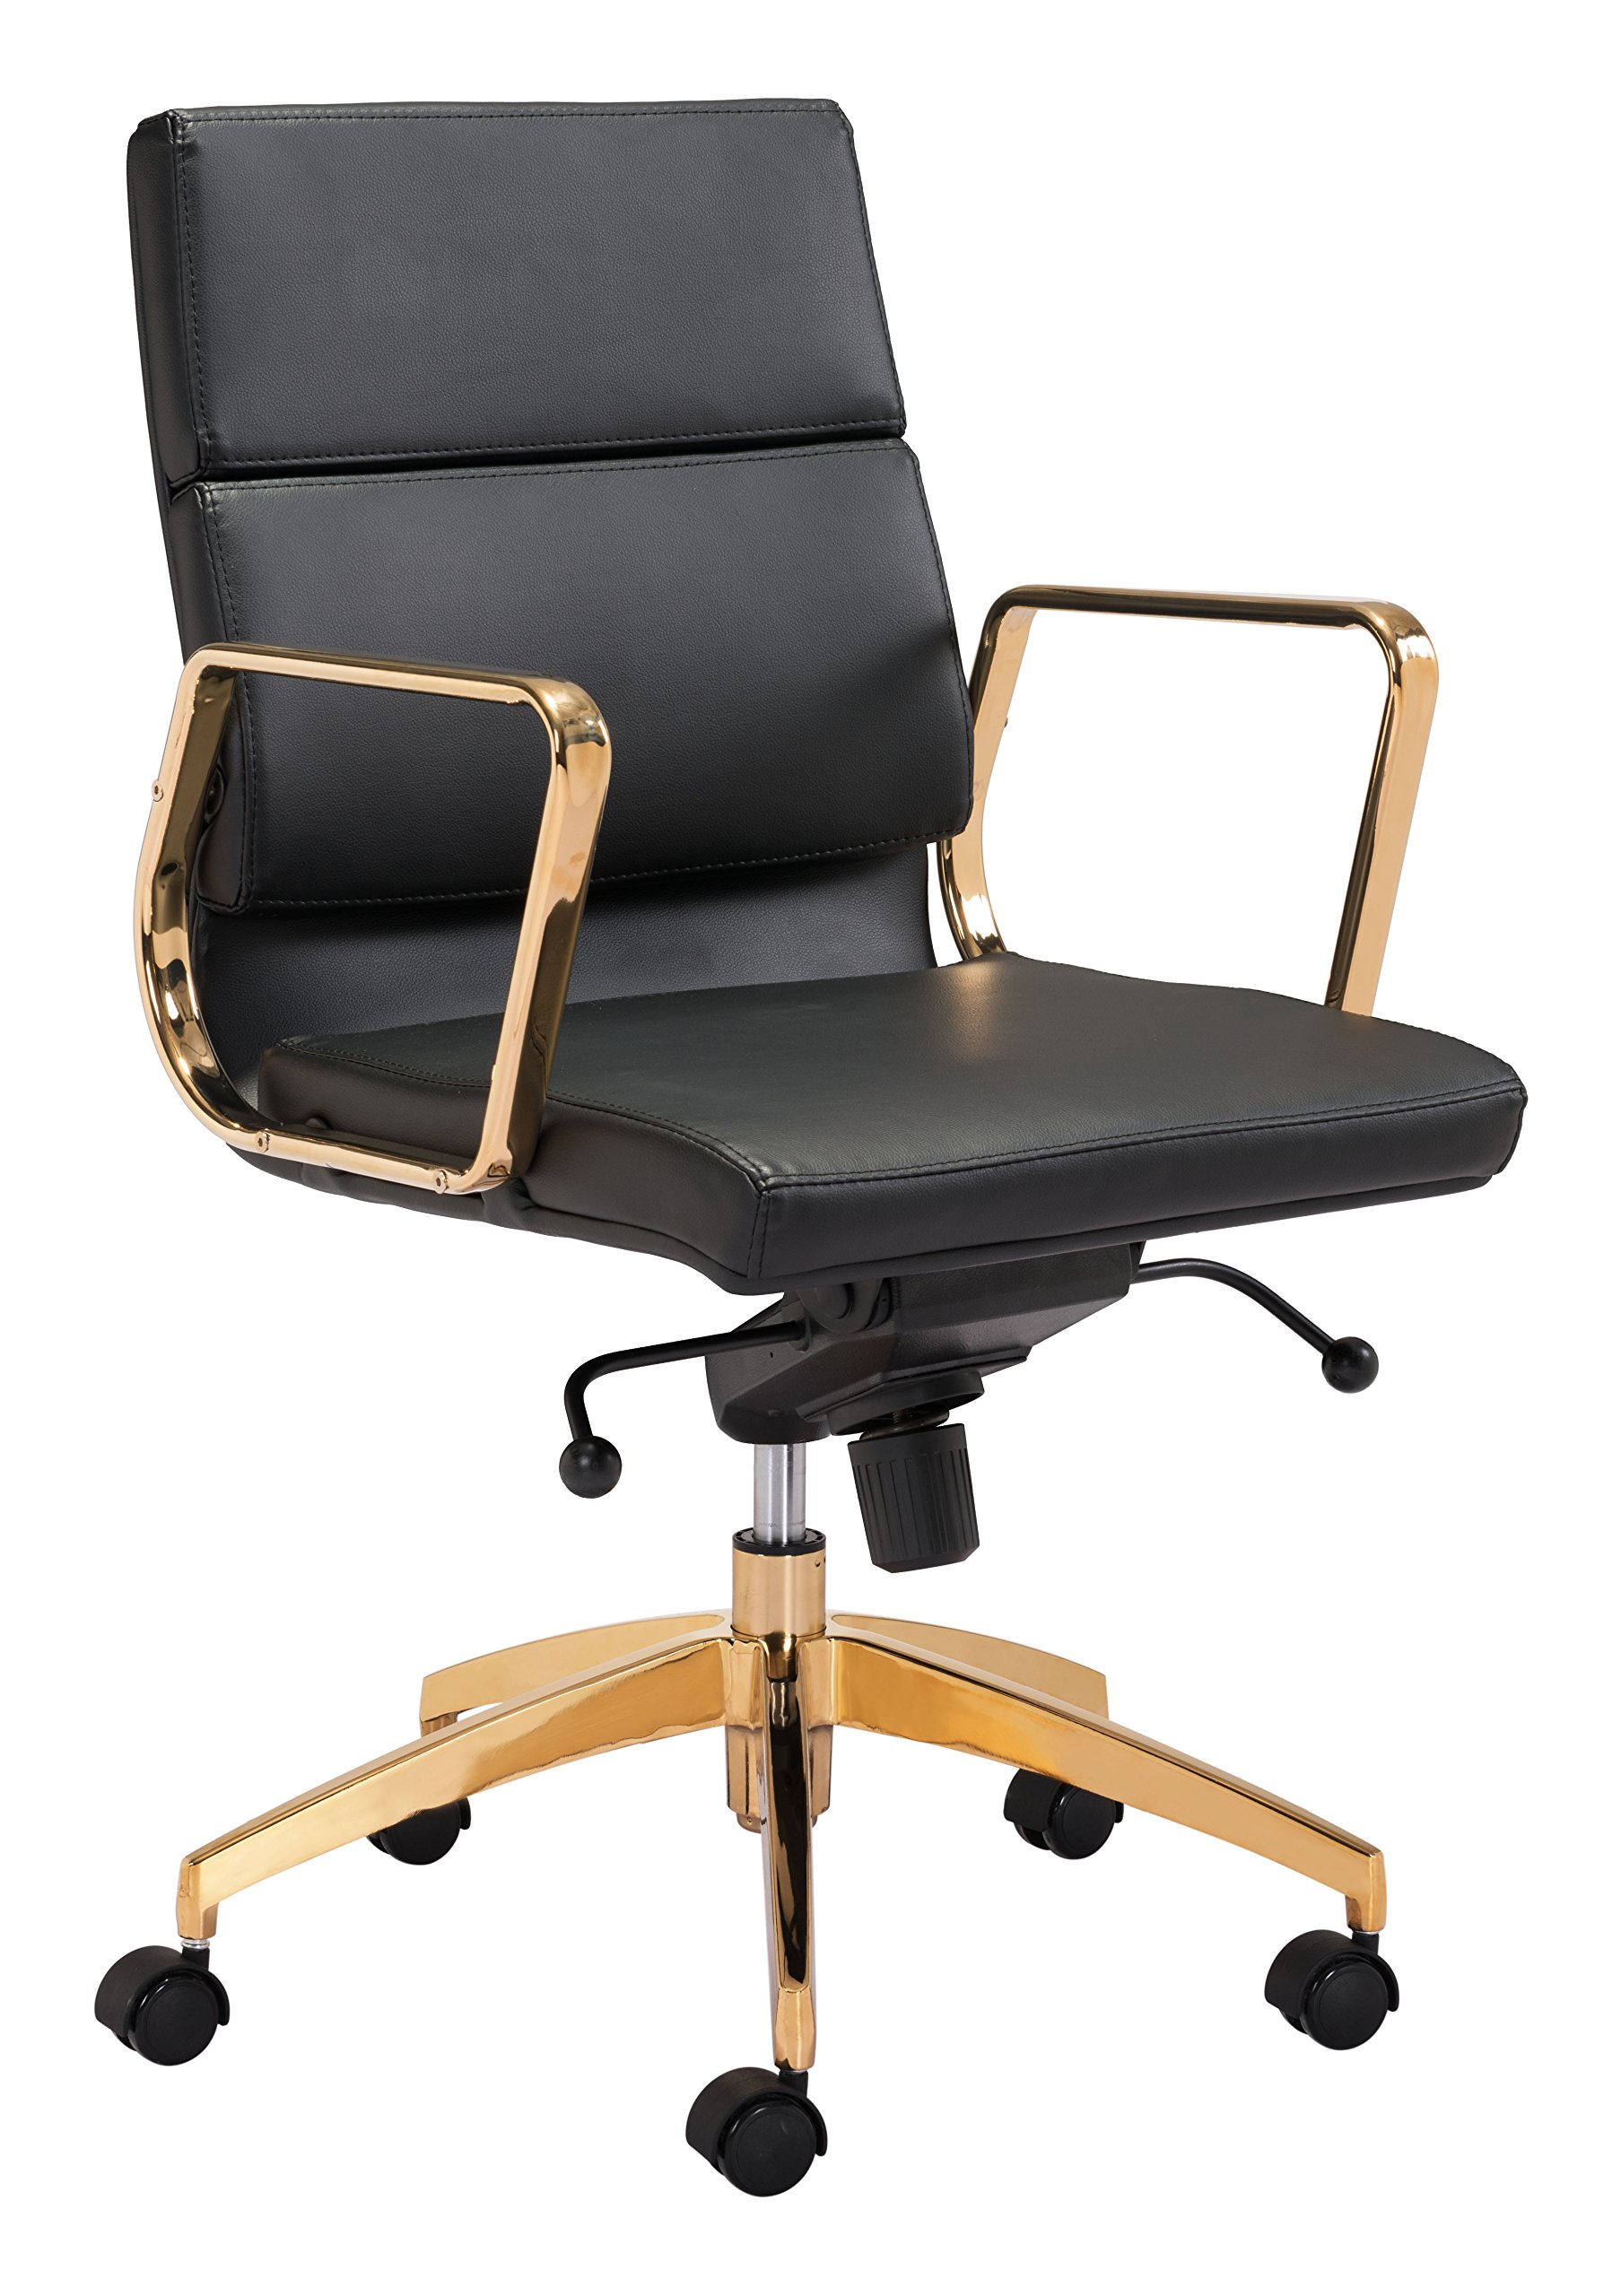 Amazon.com: Zuo Modern Scientist Low Back Office Chair, Black